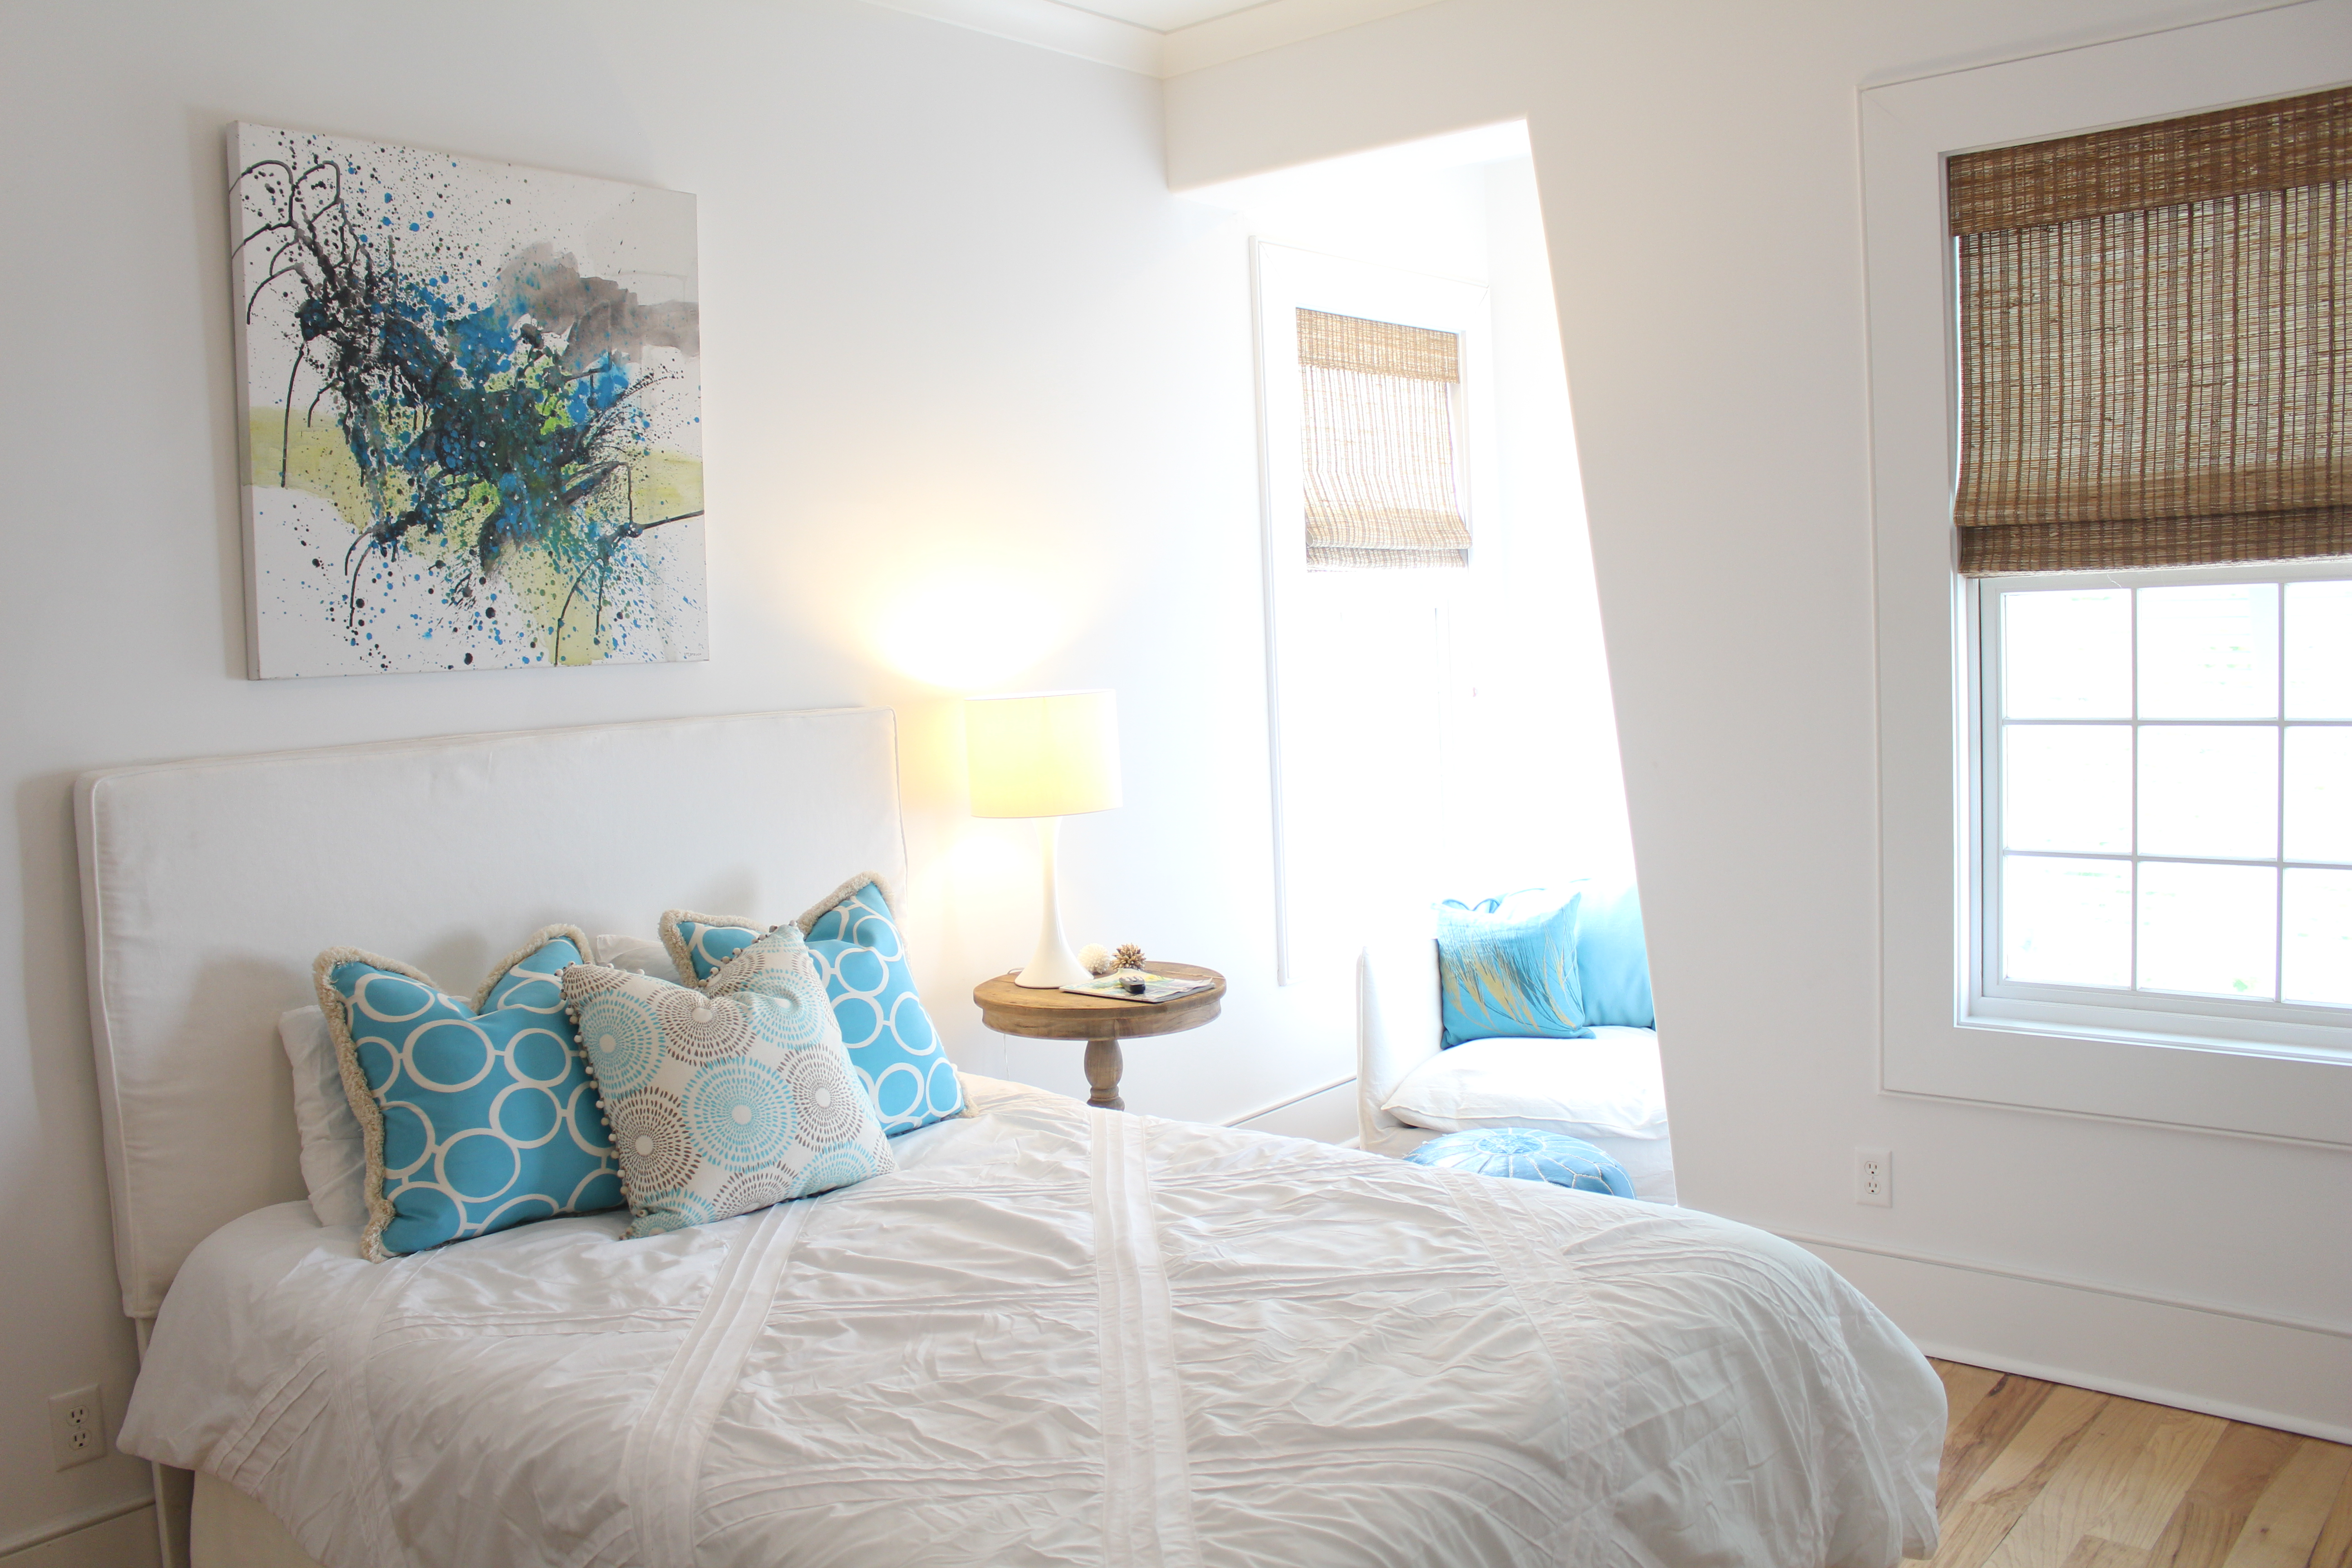 30a-alys-beach-house-rental-vacation-7